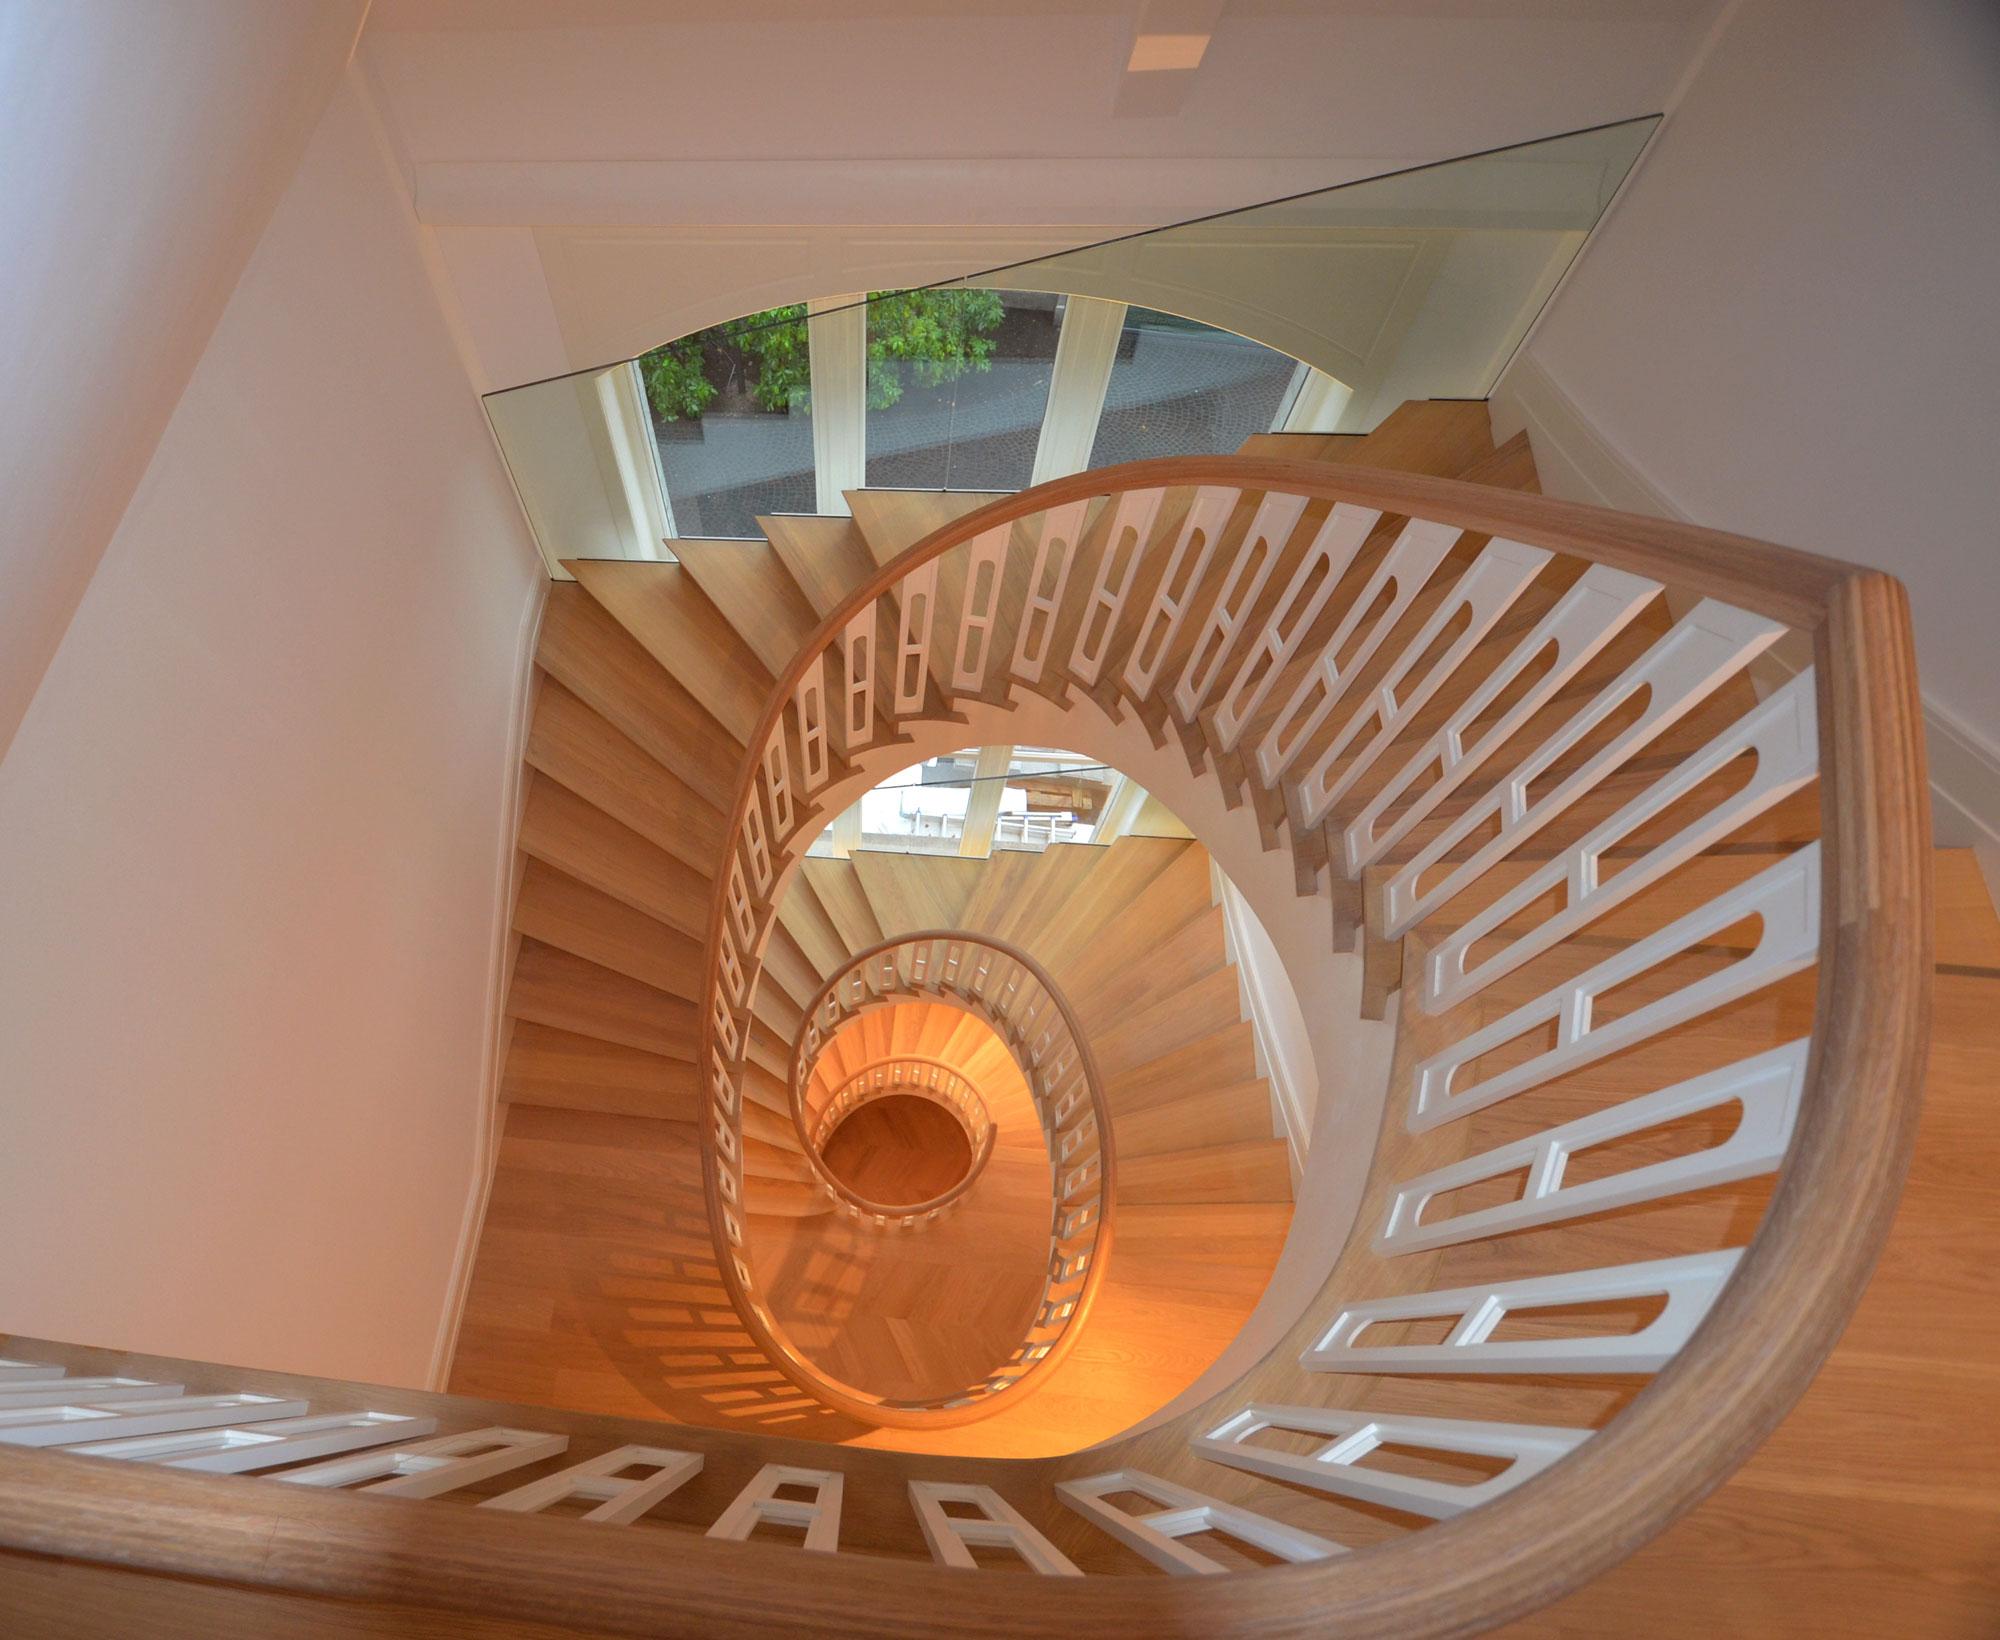 holztreppe-mit-ovalem-treppenauge-in-dreieich